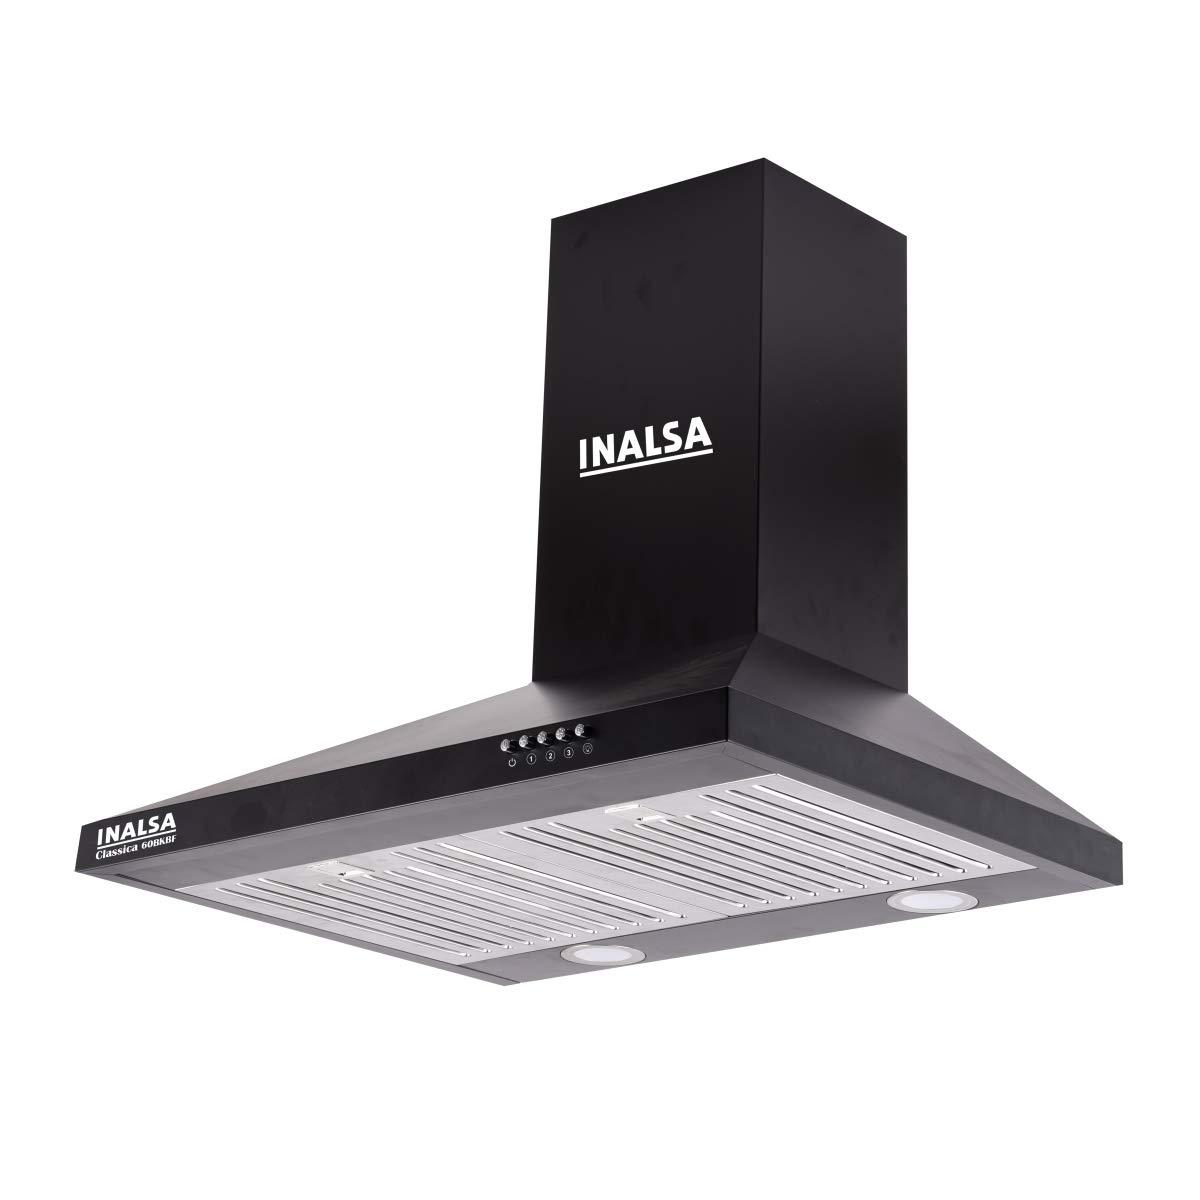 Inalsa 60 cm 875 m³/hr Pyramid Kitchen Chimney (Classica 60BKBF, Baffle Filters, Black)